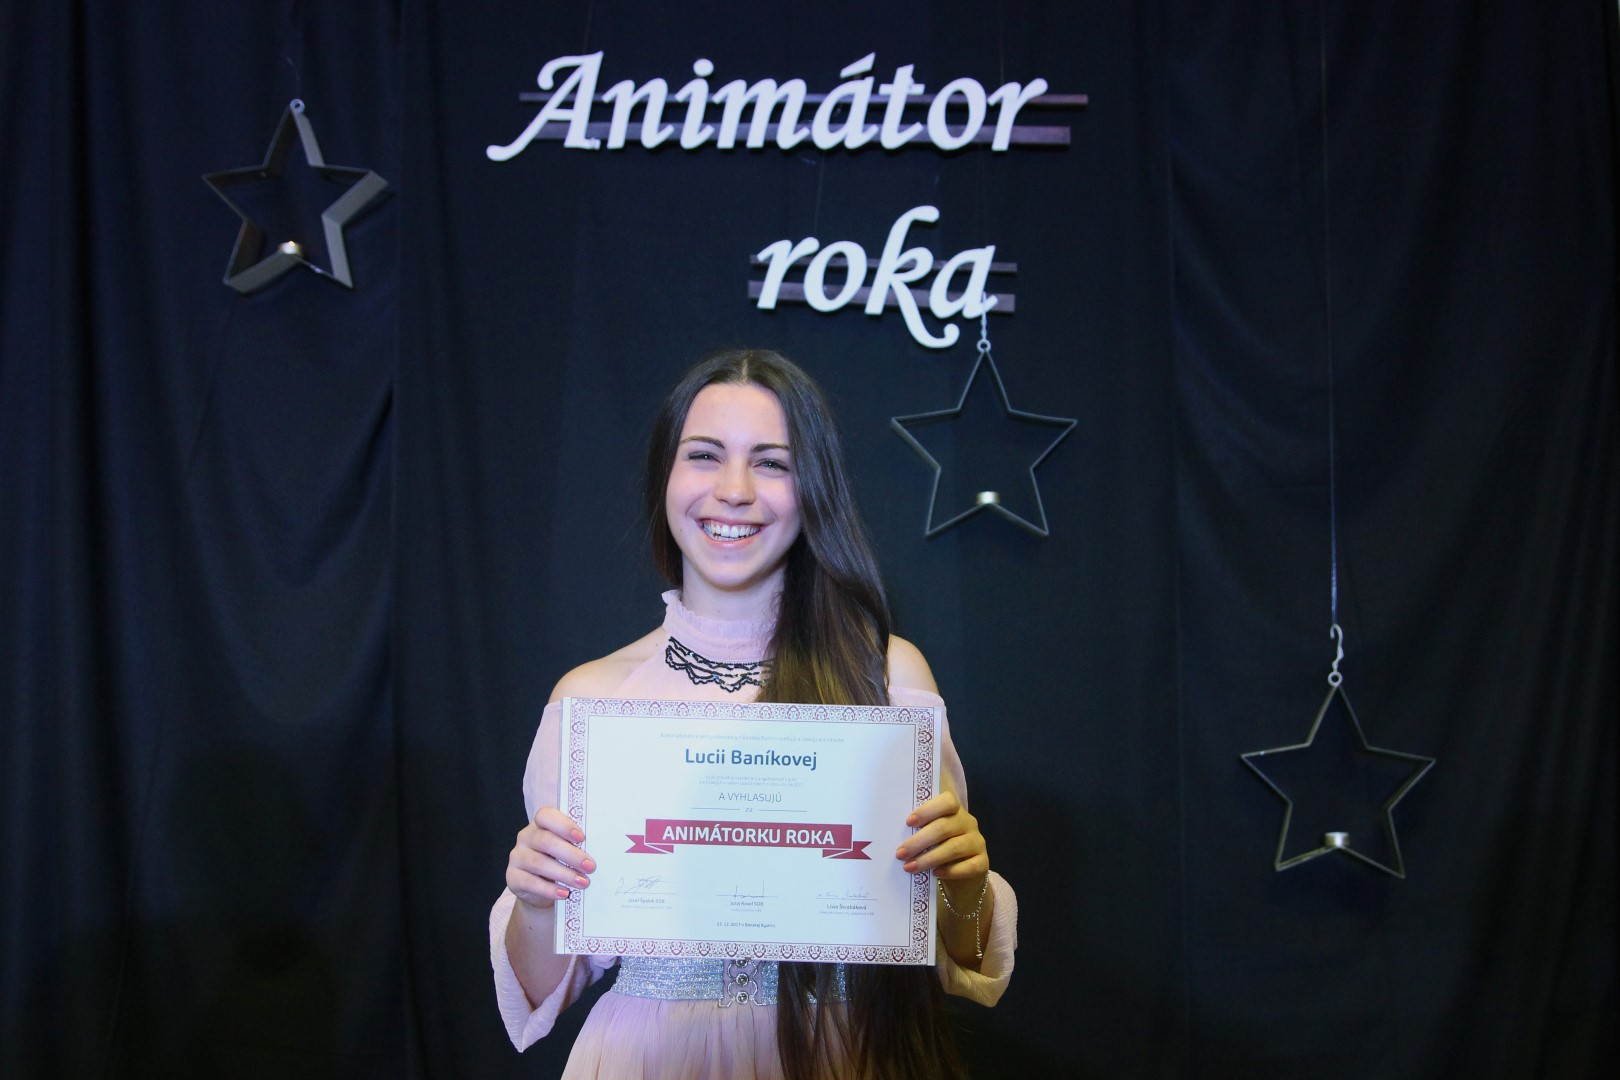 Animátorský čin roka 2017